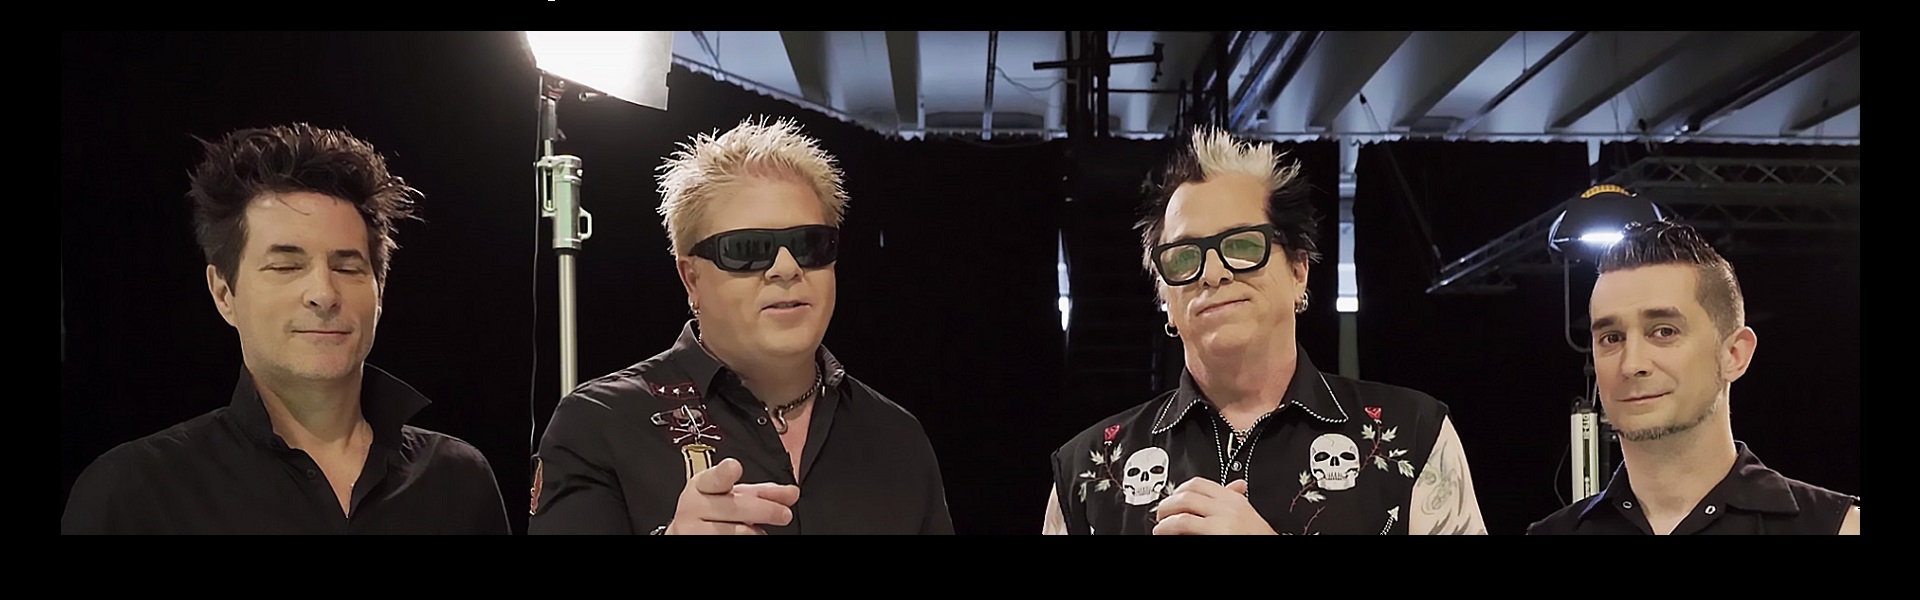 The Offspring biglietti tickets concerti Italia Mailticket | Notizie